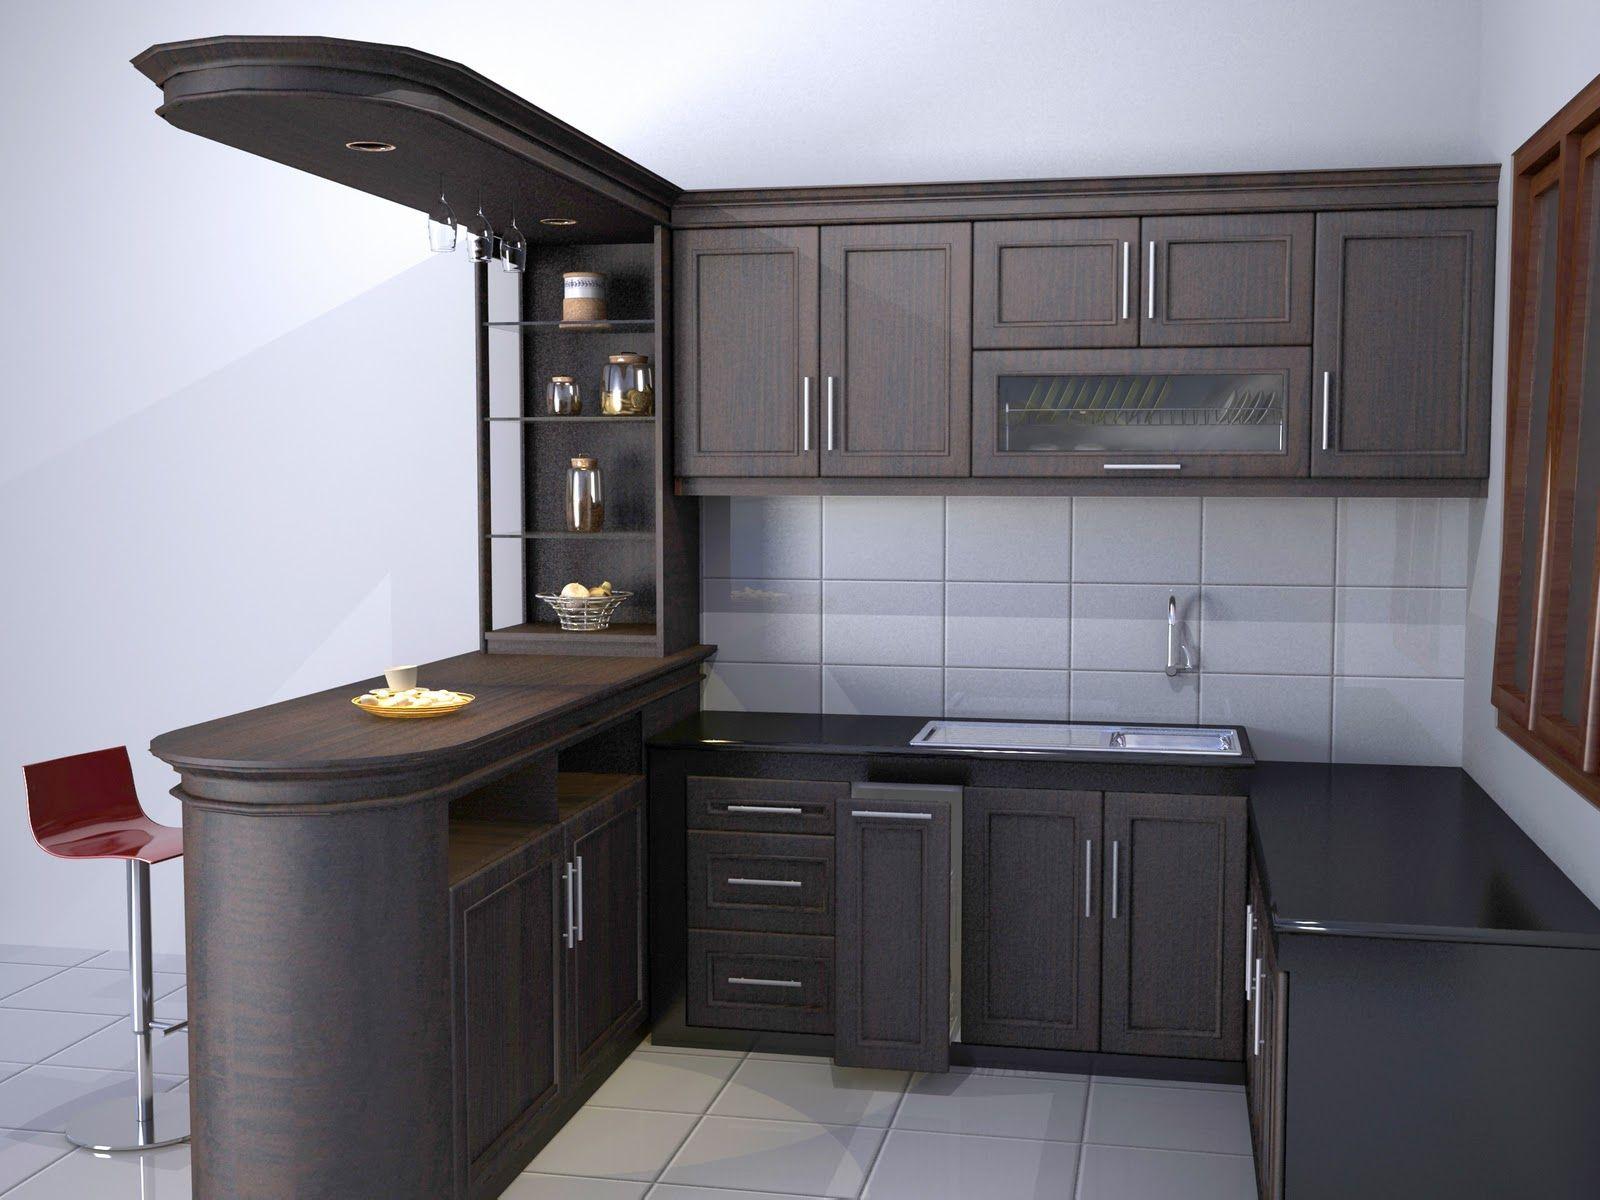 Desain Dapur Mewah Modern 3d Cek Bahan Bangunan